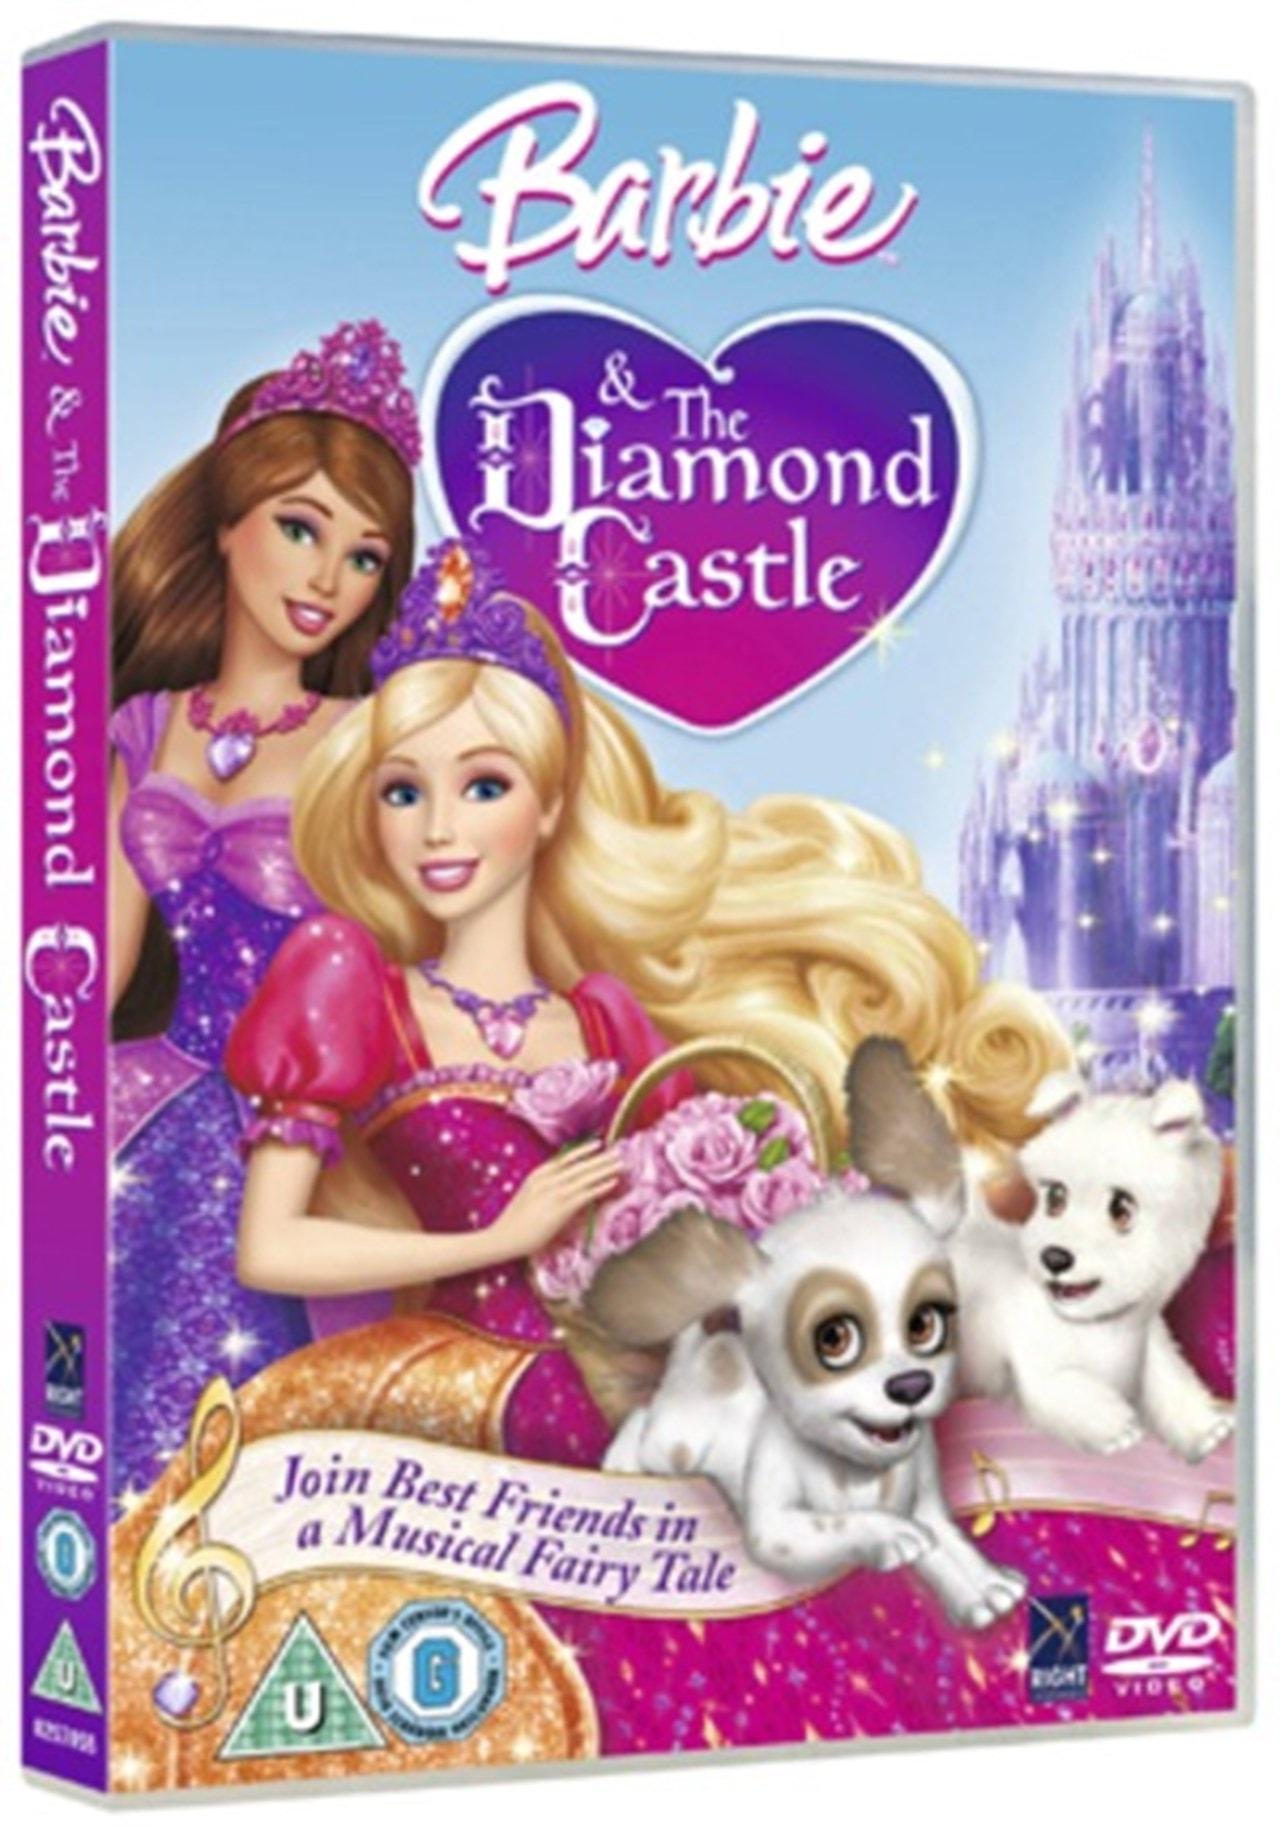 Barbie and the Diamond Castle - 1